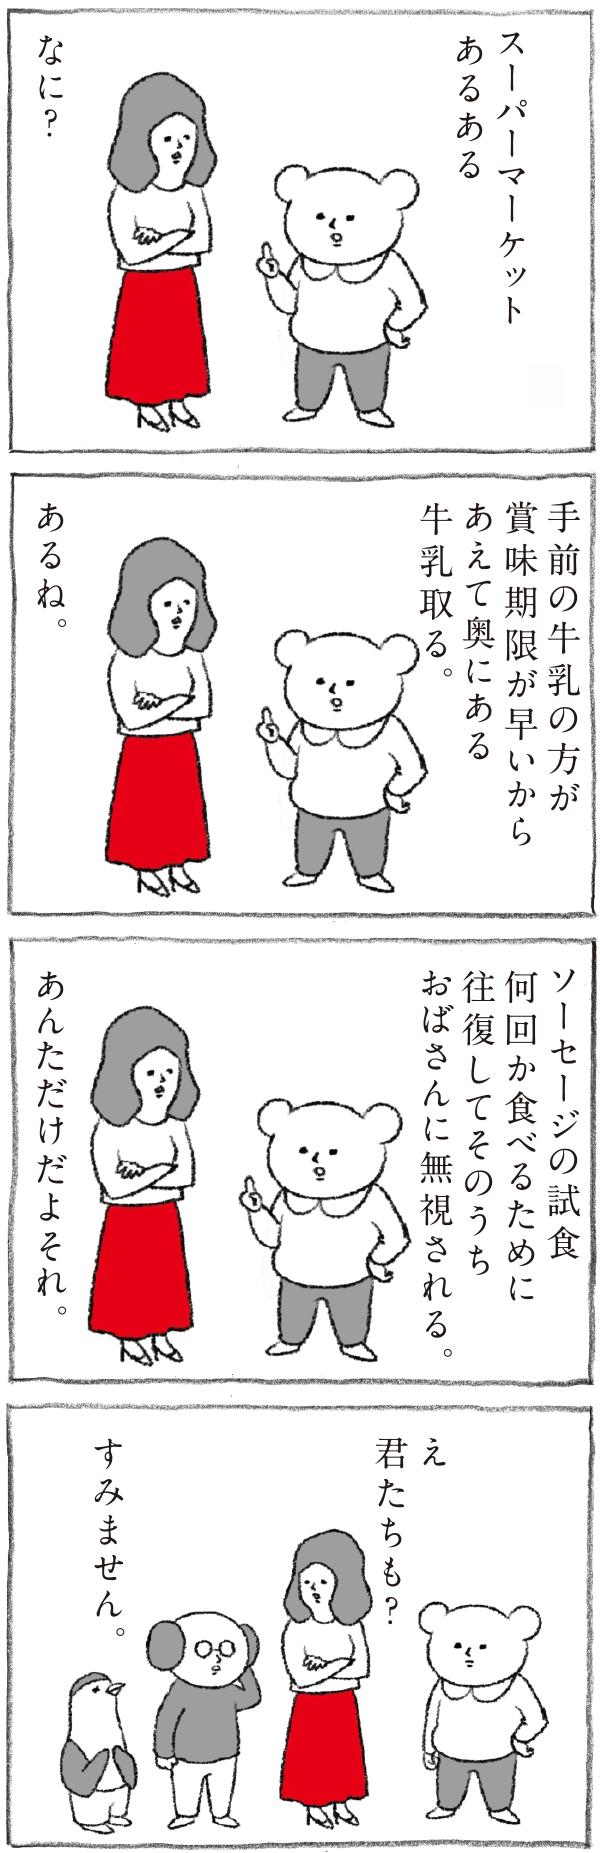 Hanako 1190号:おかわり自由